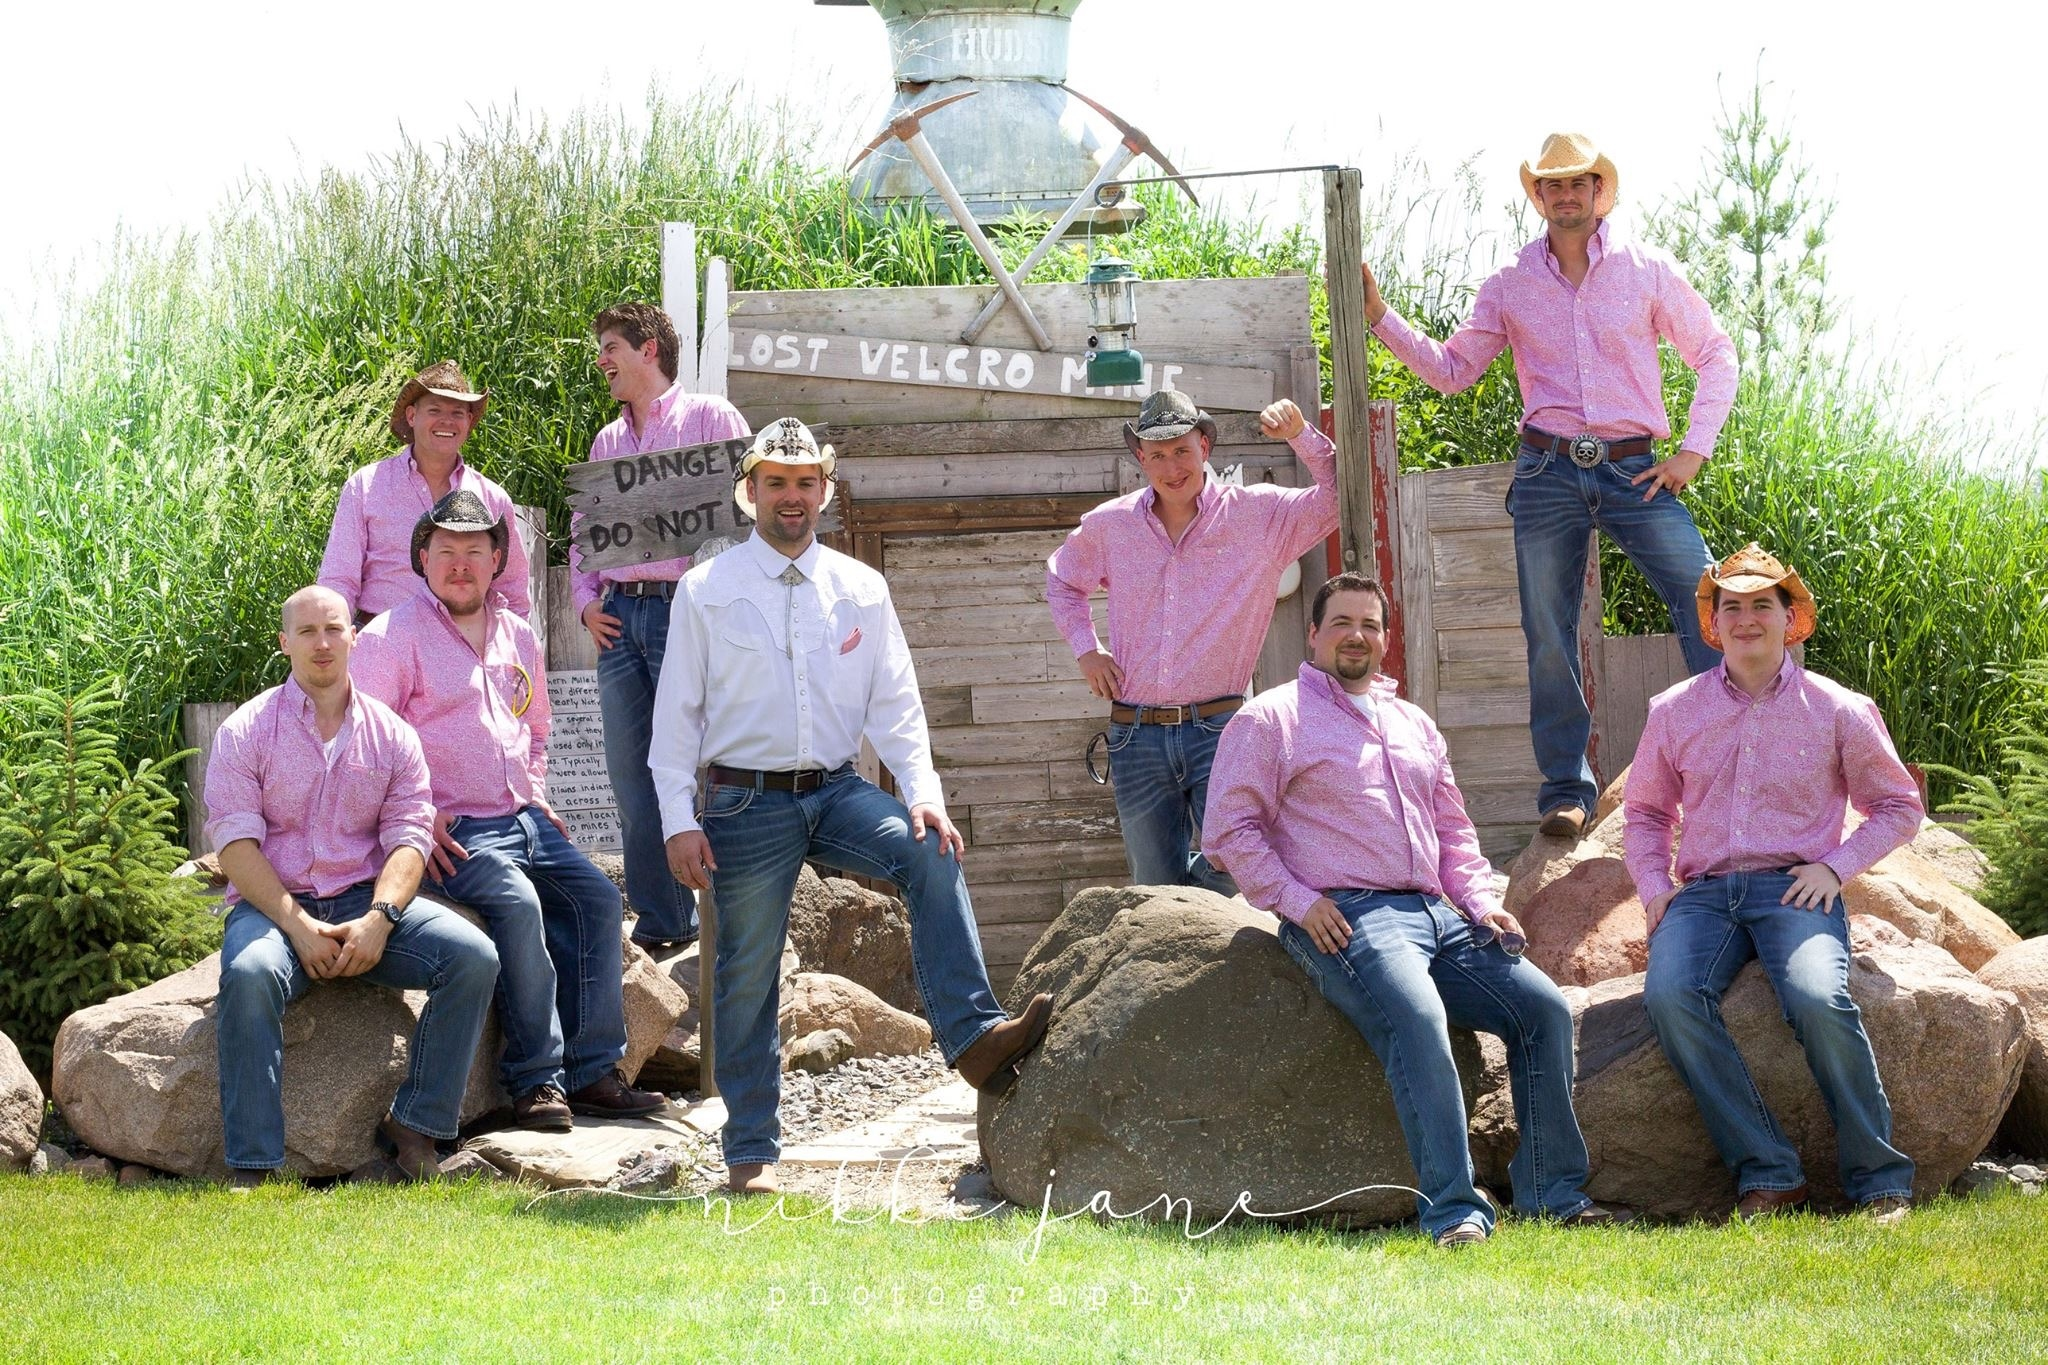 The Historic Deglman Farm image 7